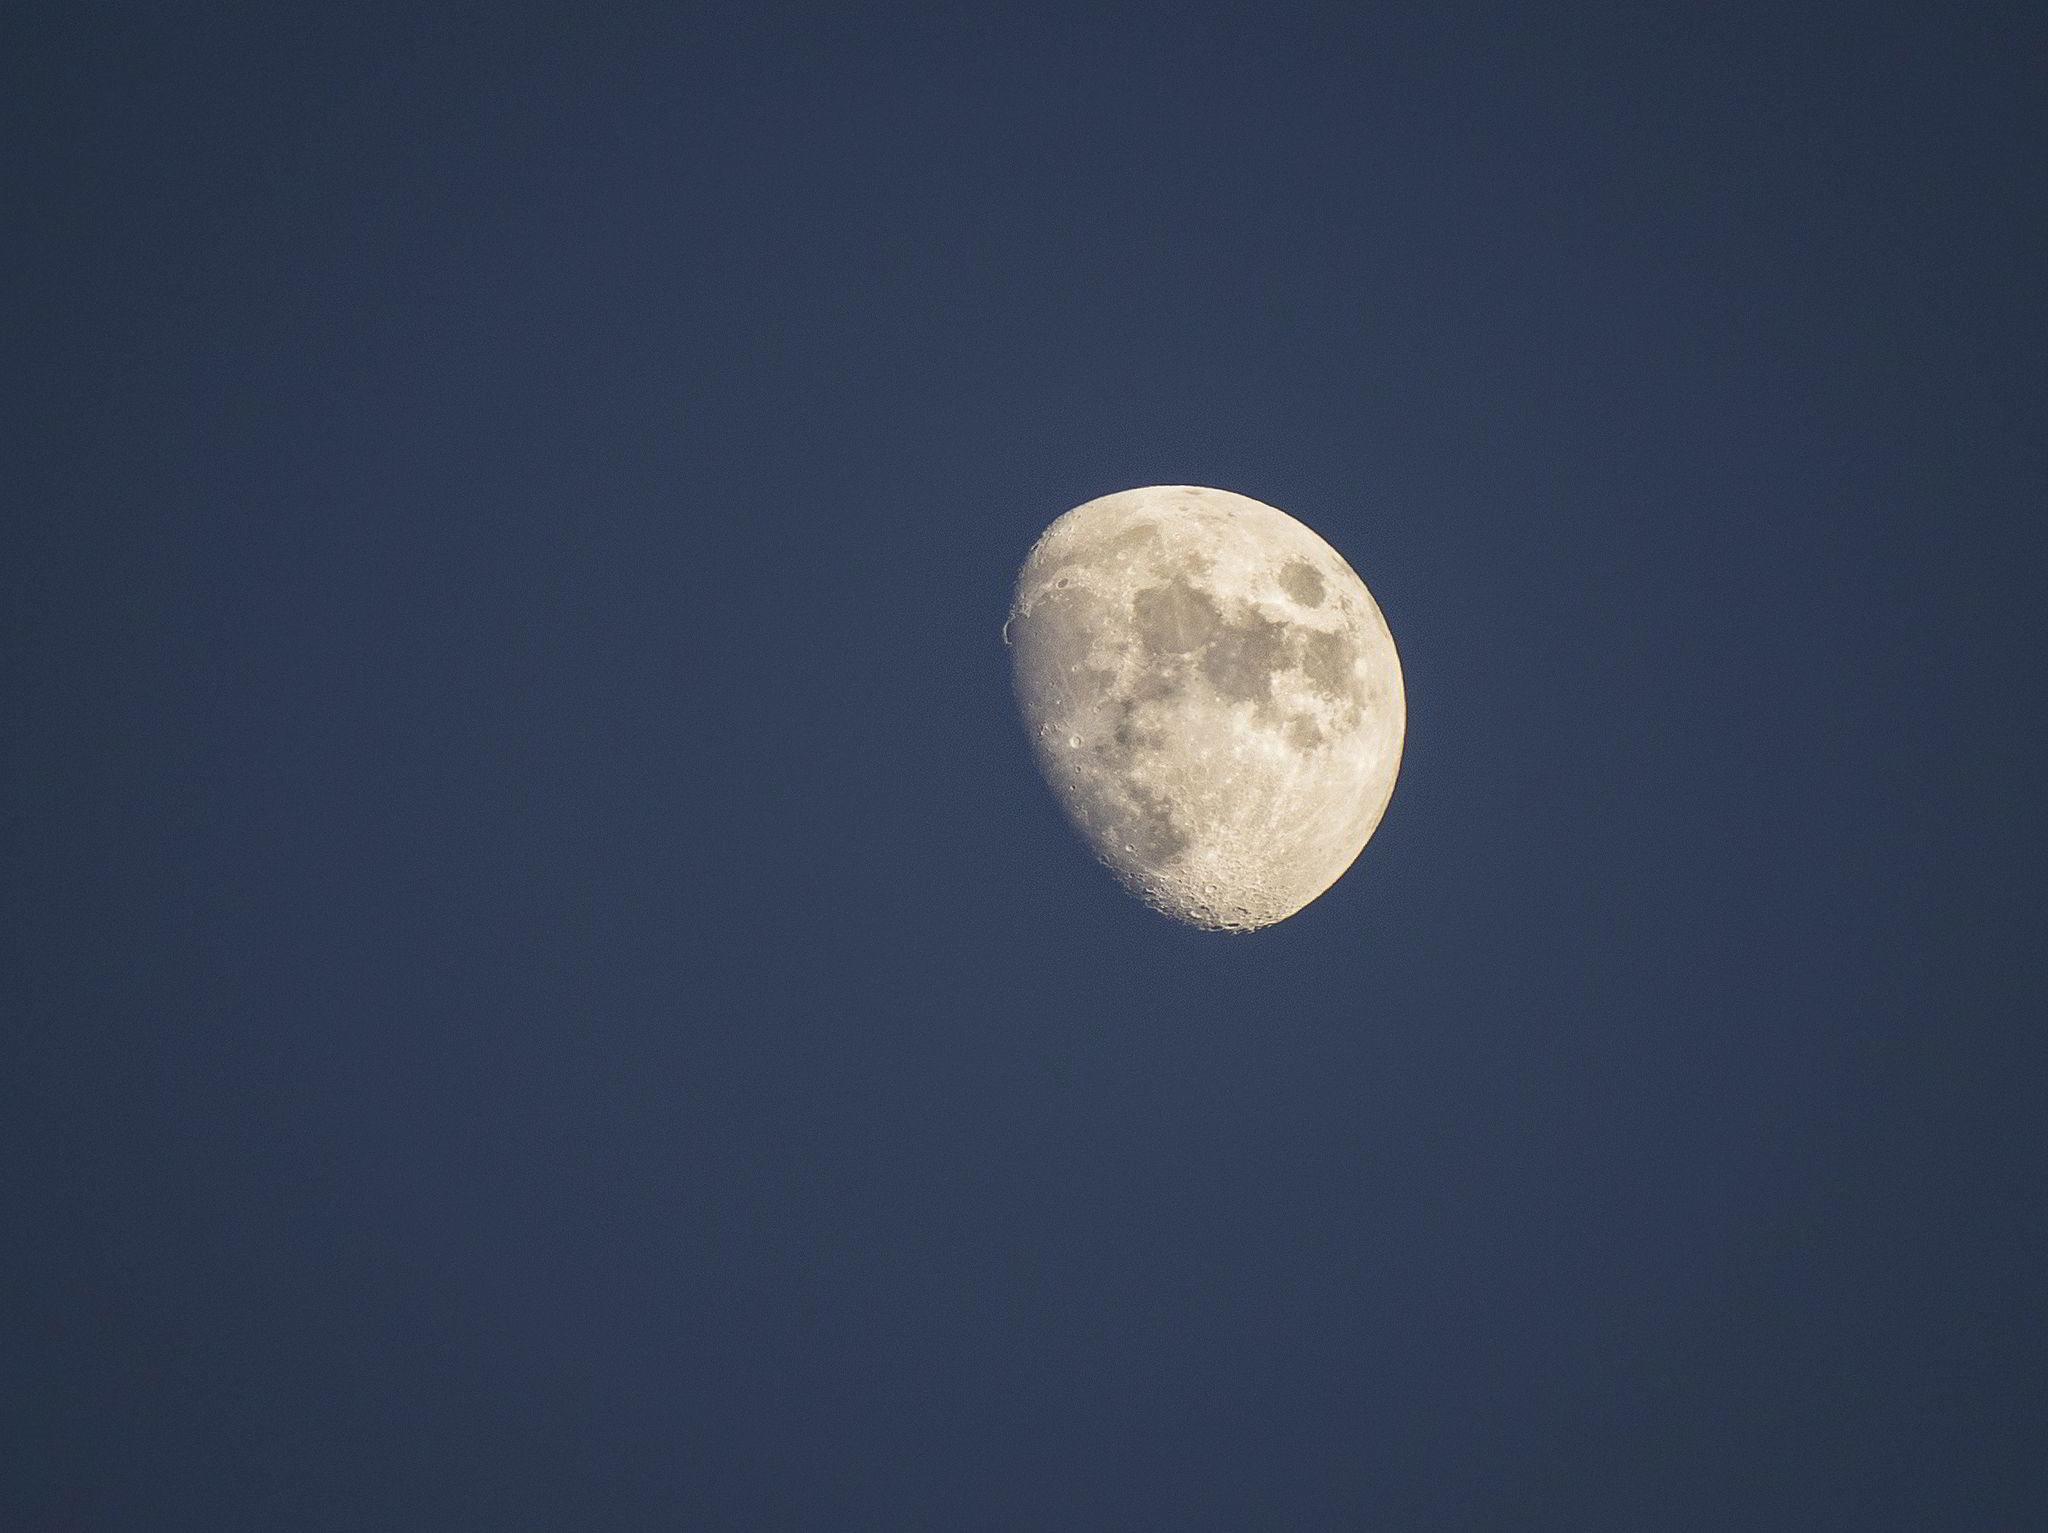 Симорон денежные ритуалы на растущую луну